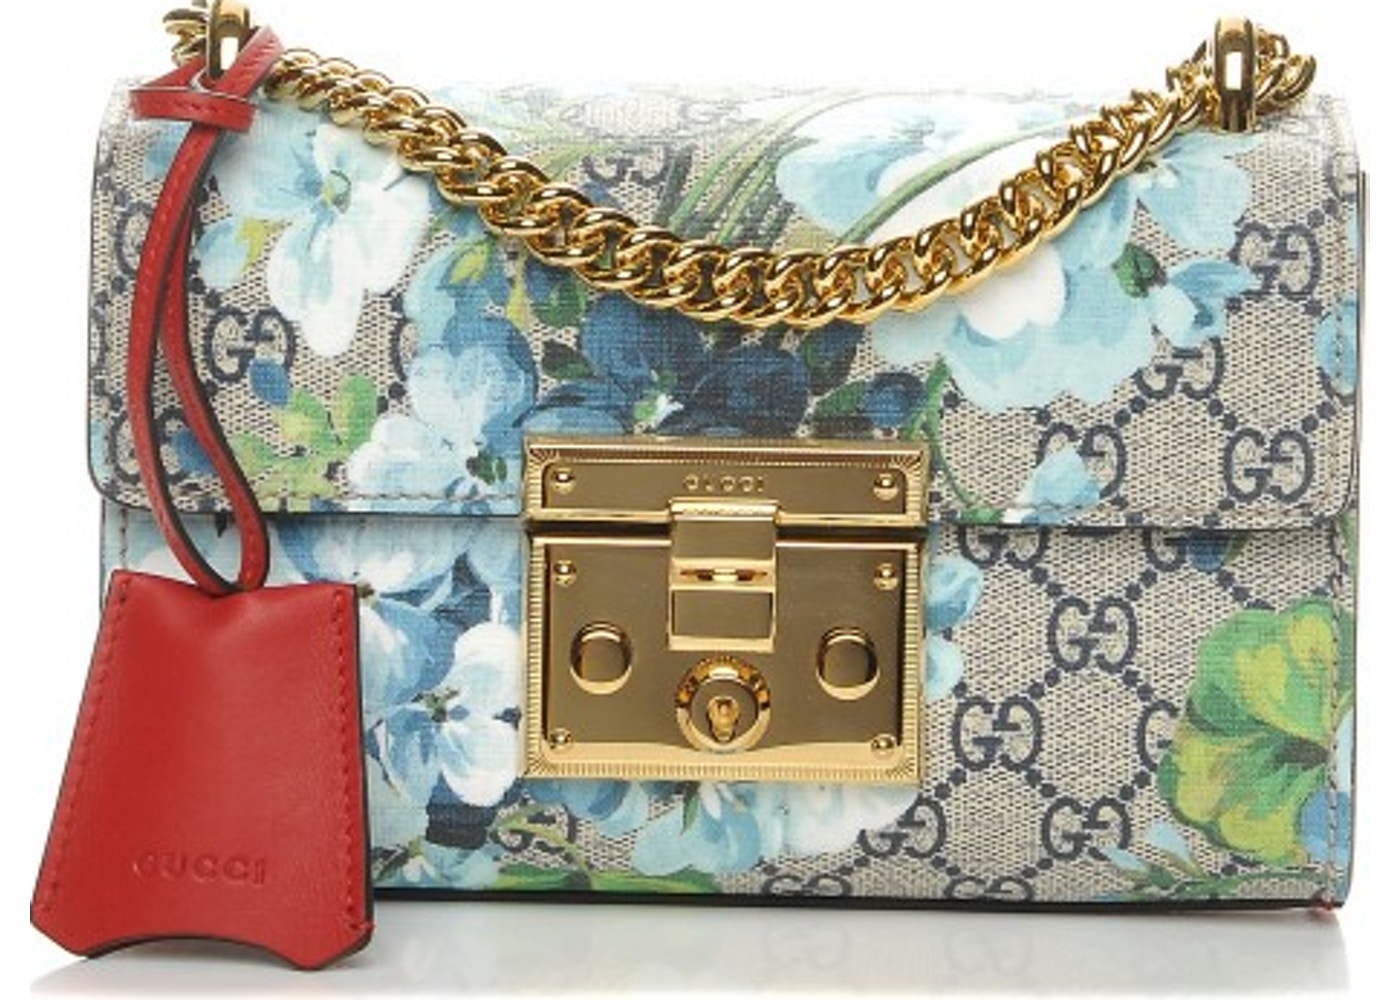 599fa8a5 Gucci Padlock Shoulder Bag Blooms GG Supreme Small Blue/Red/Beige. Blooms  GG Supreme Small Blue/Red/Beige